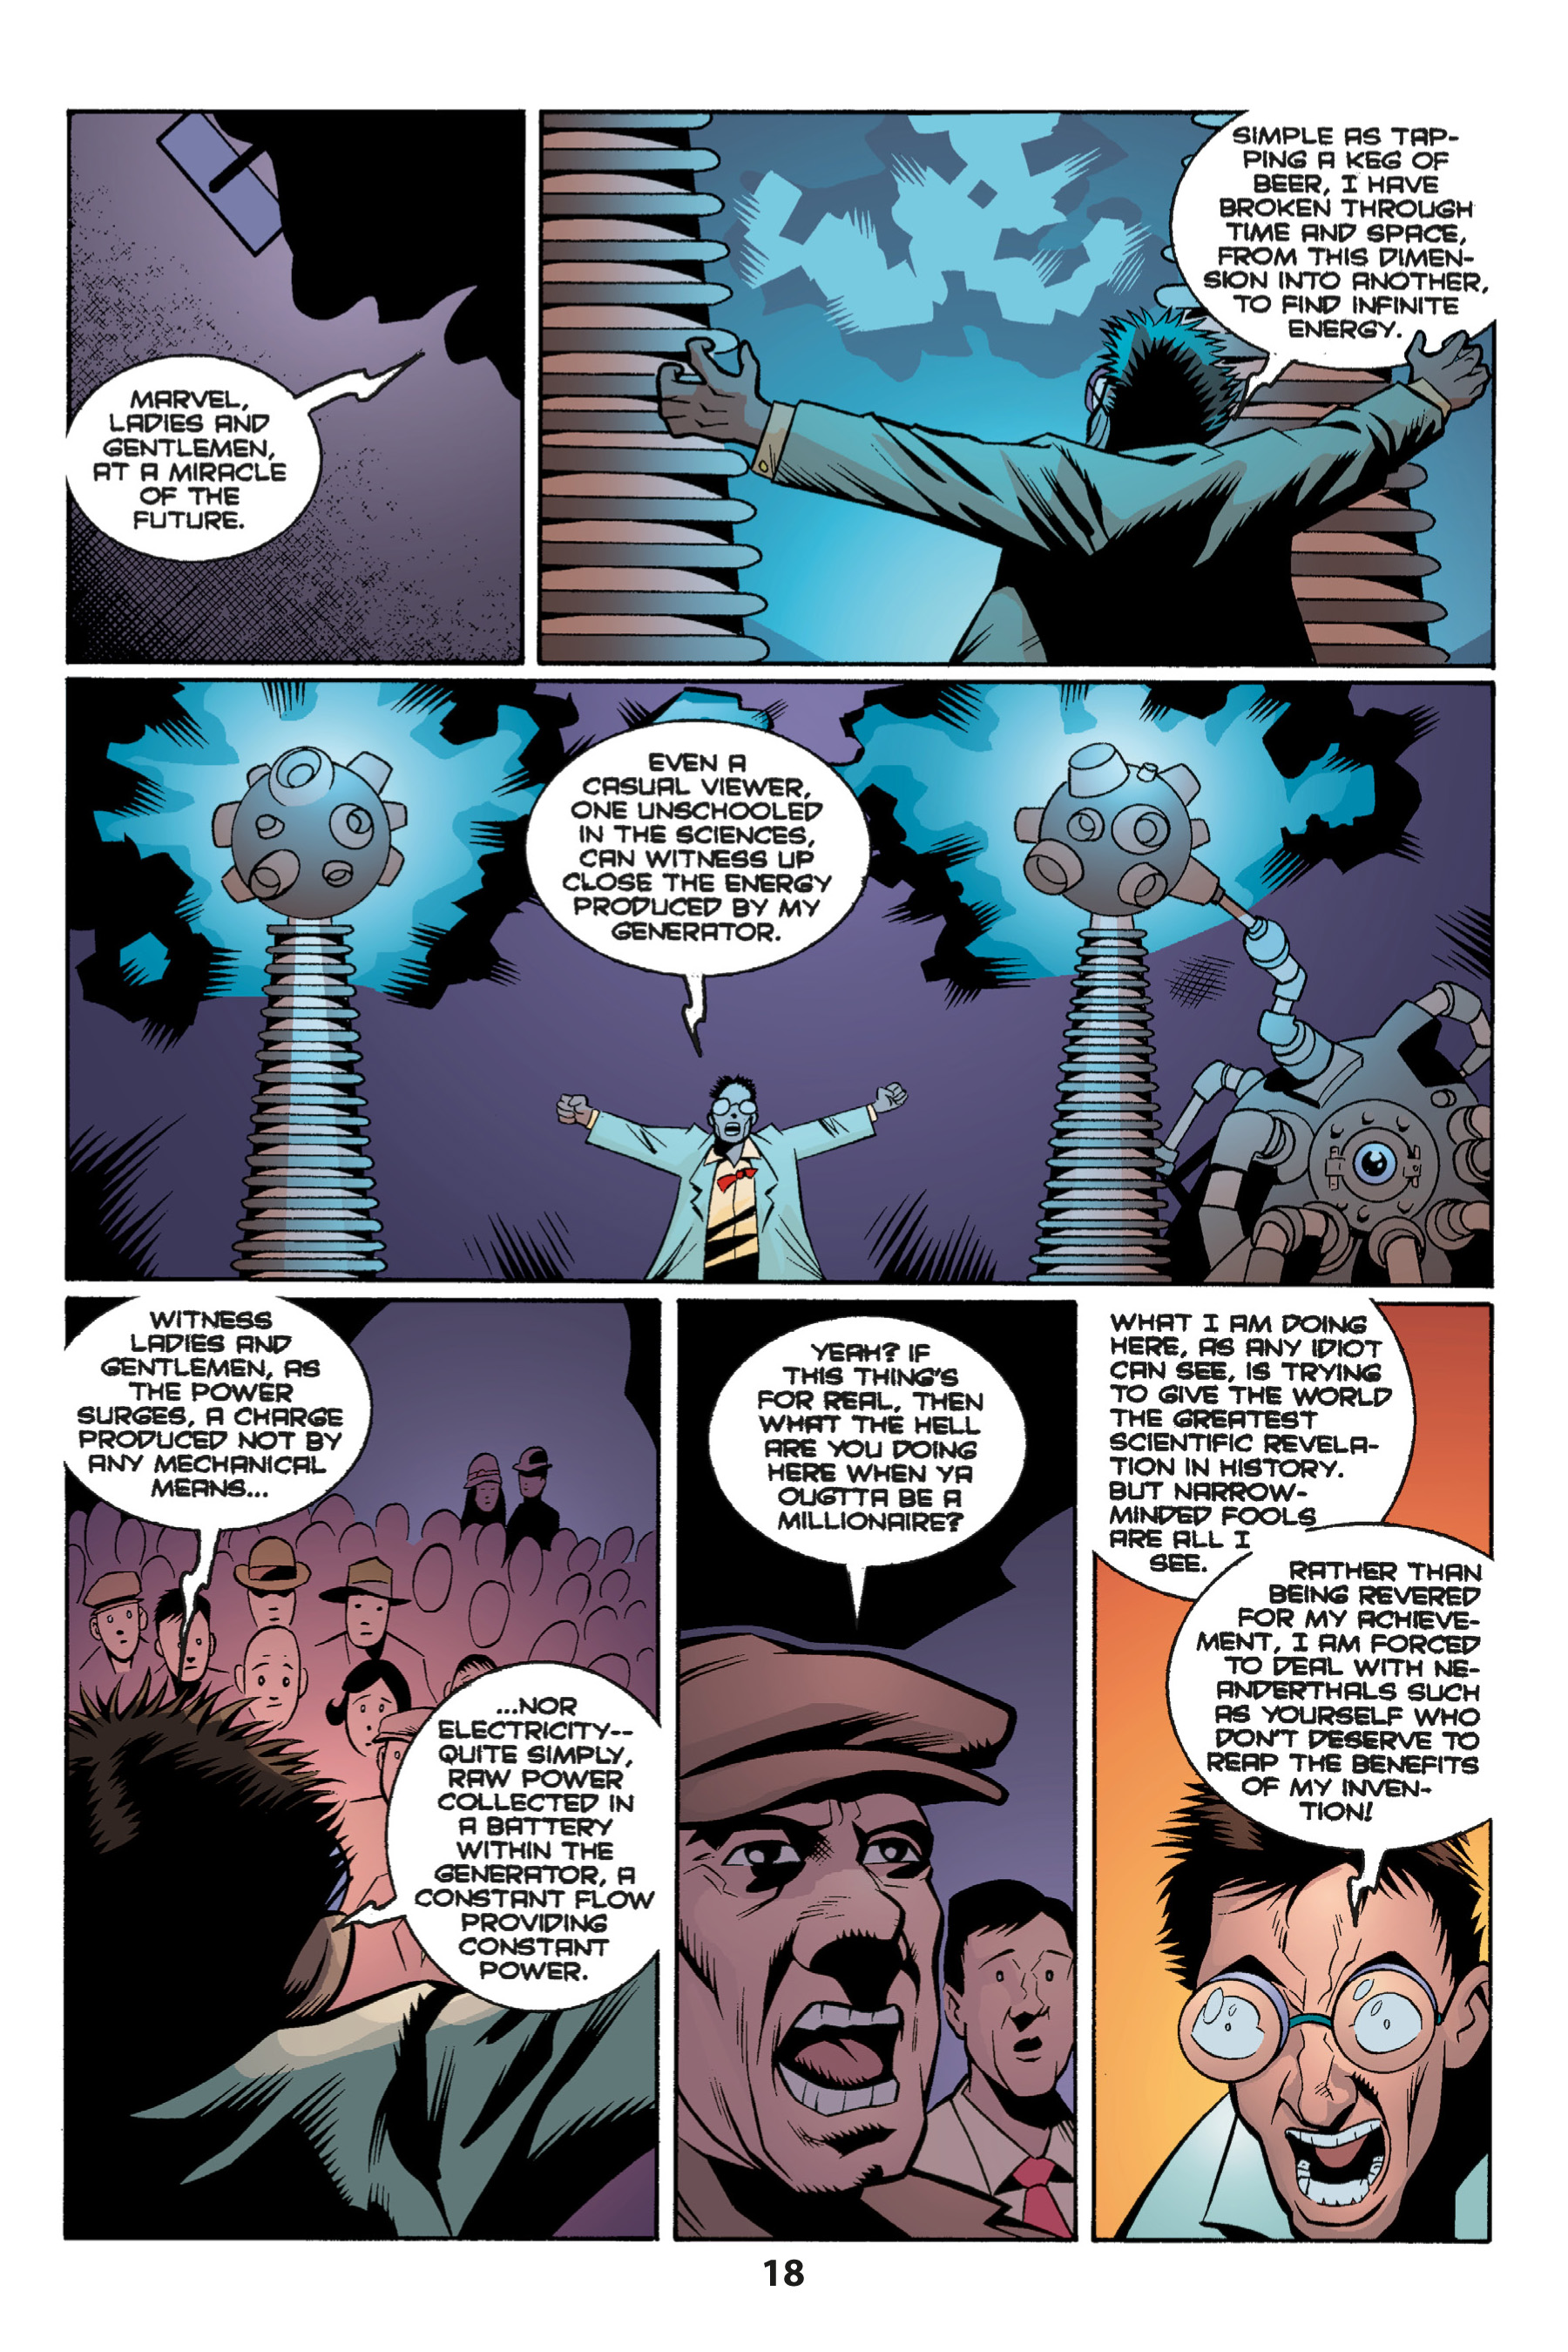 Read online Buffy the Vampire Slayer: Omnibus comic -  Issue # TPB 1 - 20